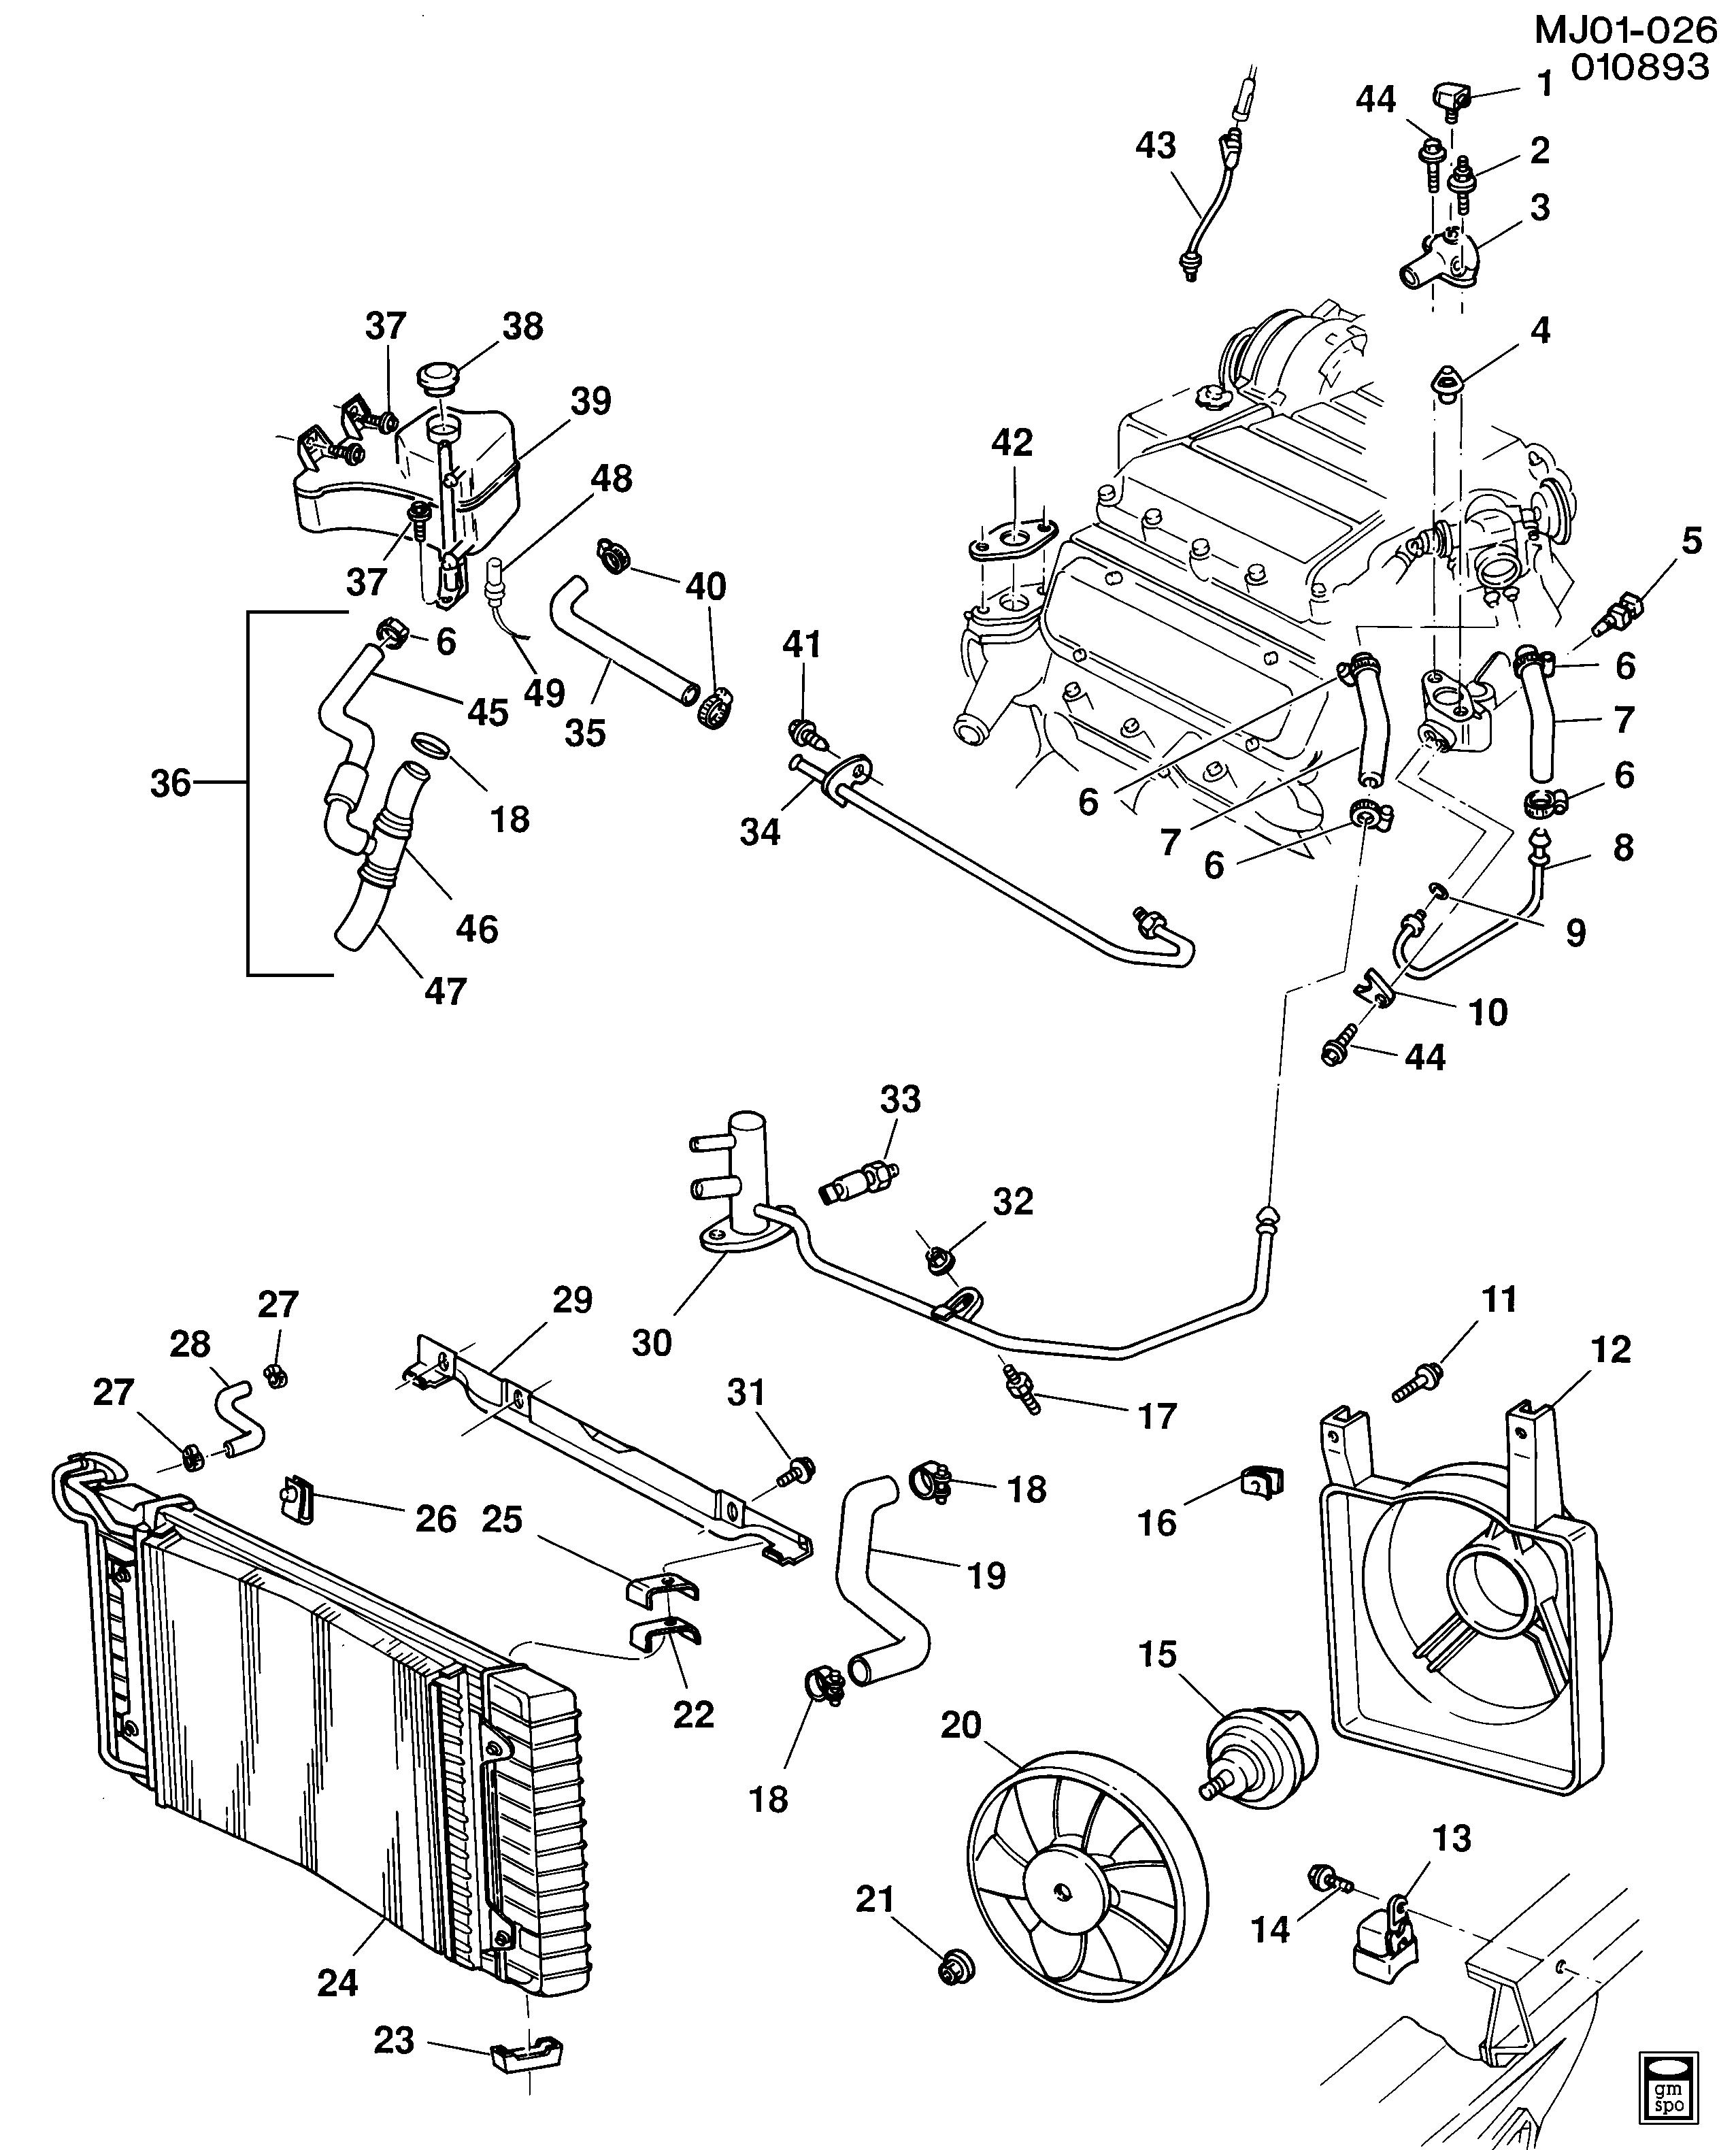 gm 3100 engine coolant diagram - wiring diagram export forge-enter -  forge-enter.congressosifo2018.it  congressosifo2018.it